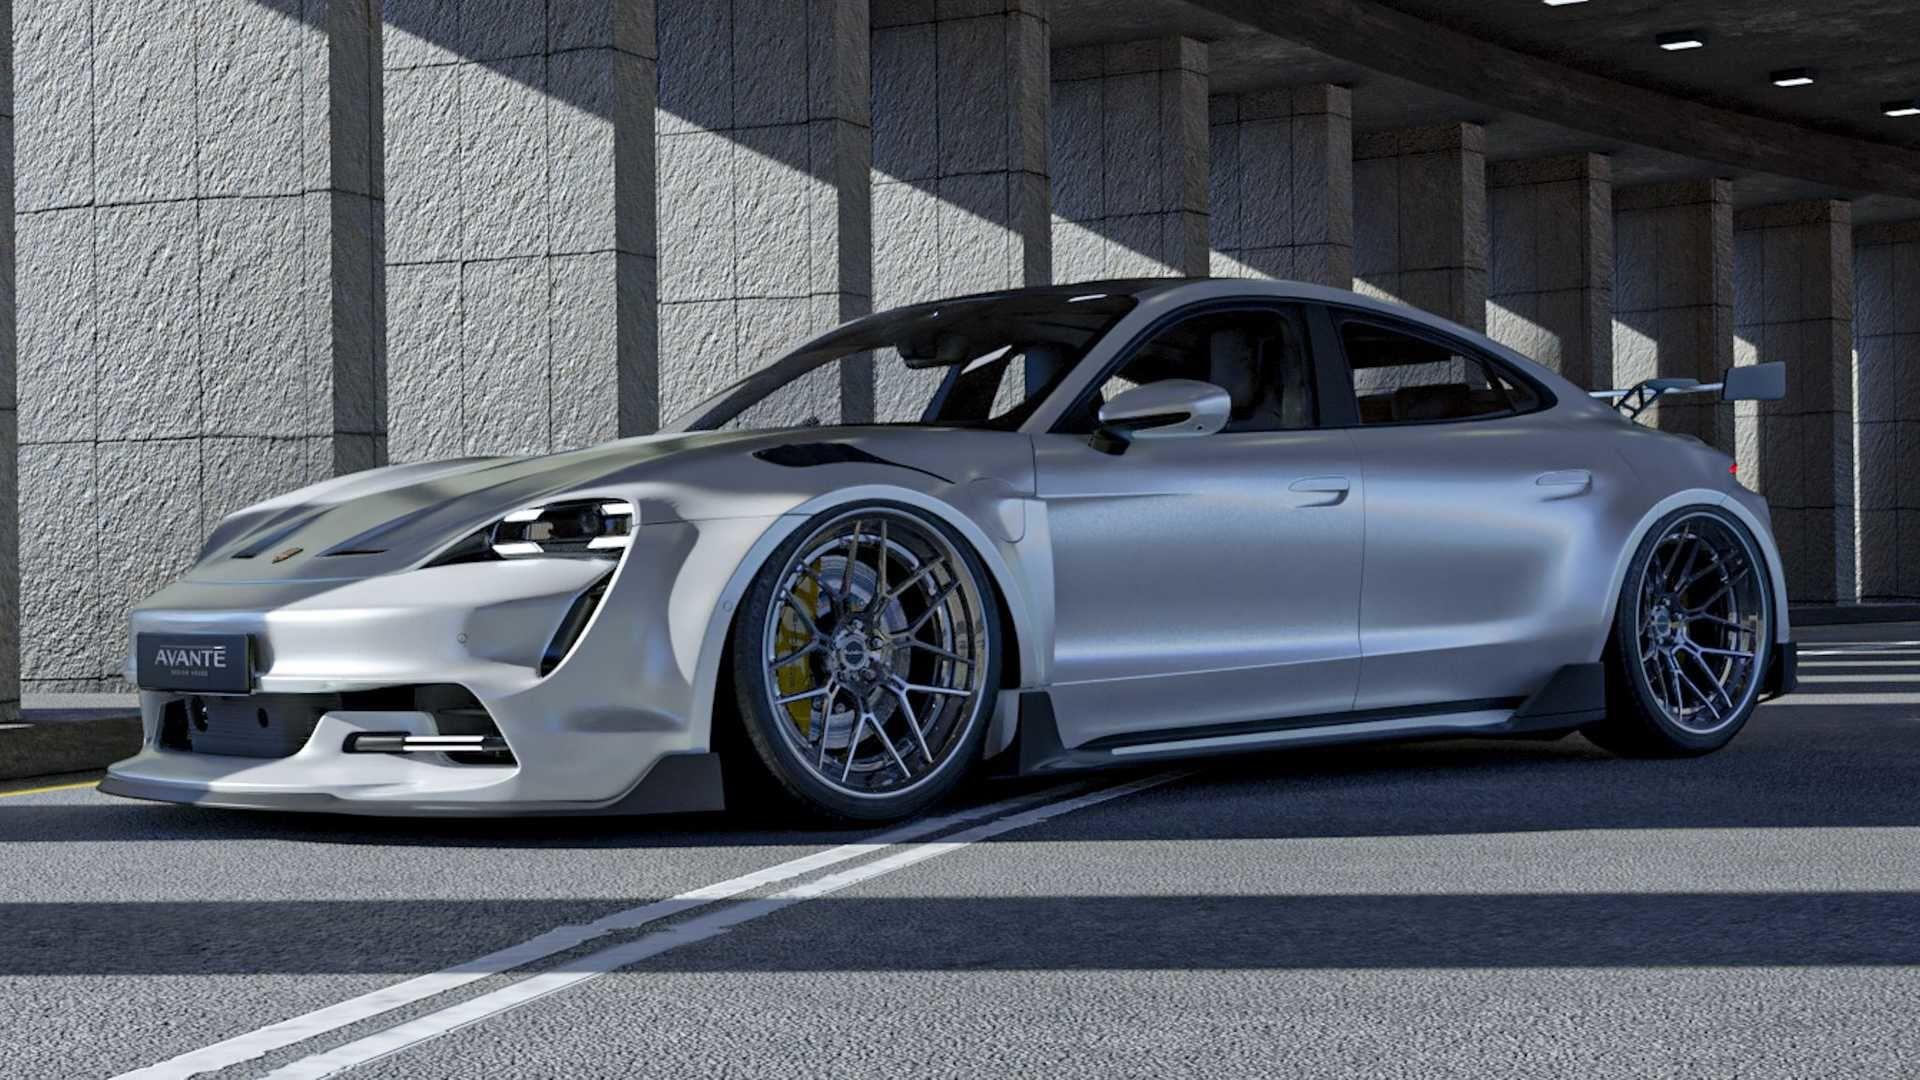 GT3 RS 風格加持的 Porsche Taycan 感覺很有搞頭!